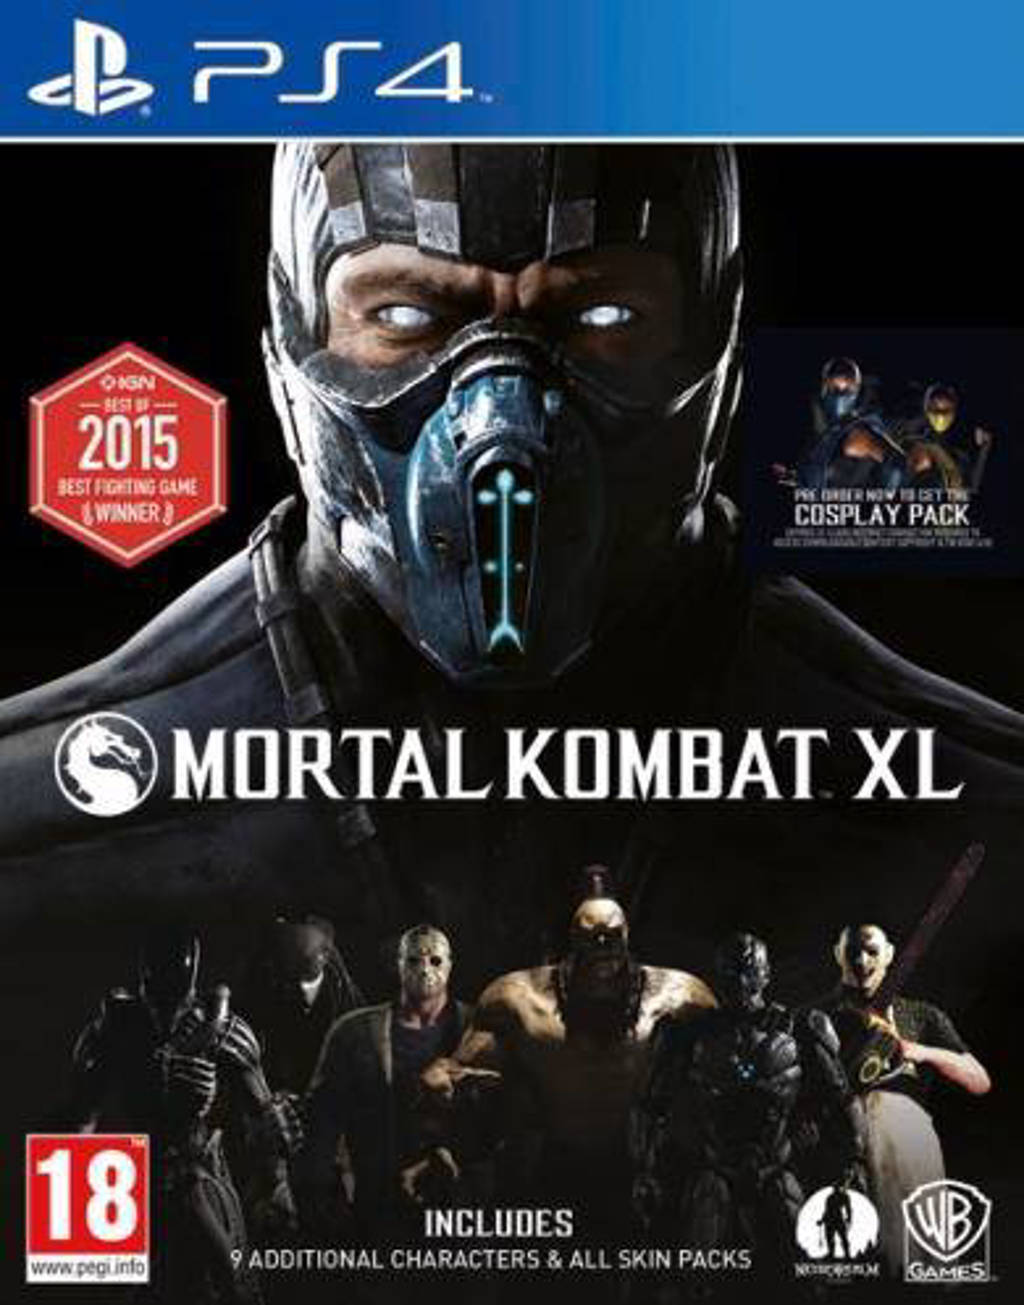 Mortal kombat XL (PlayStation 4)